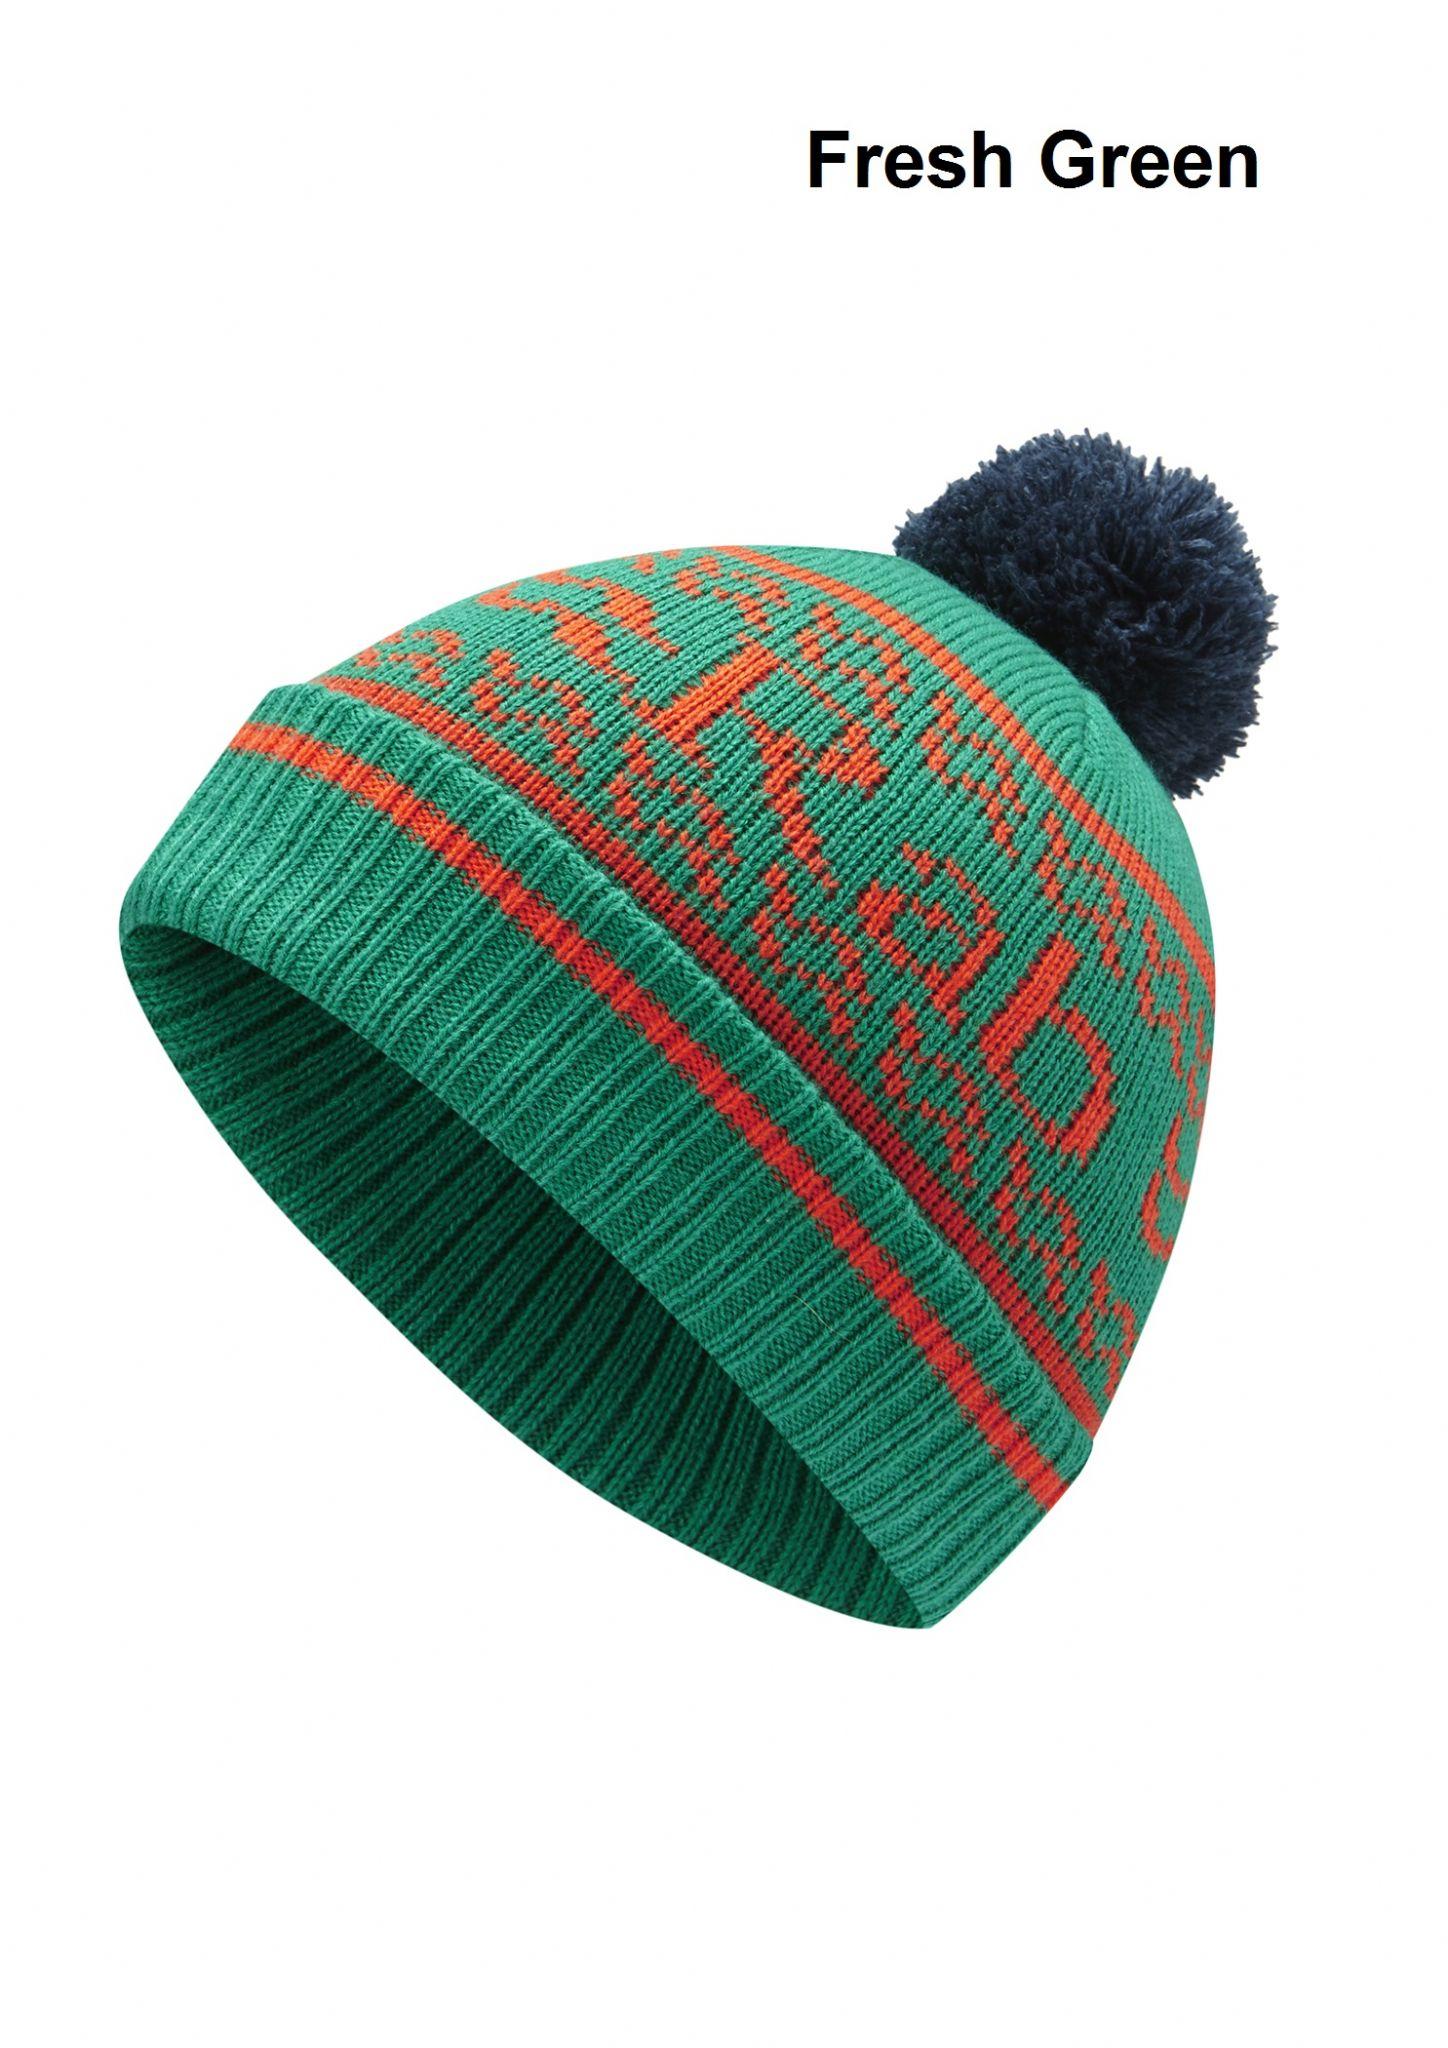 Rab Rock Bobble Hat - Soft - Warm - Beanie 64b5d8252419